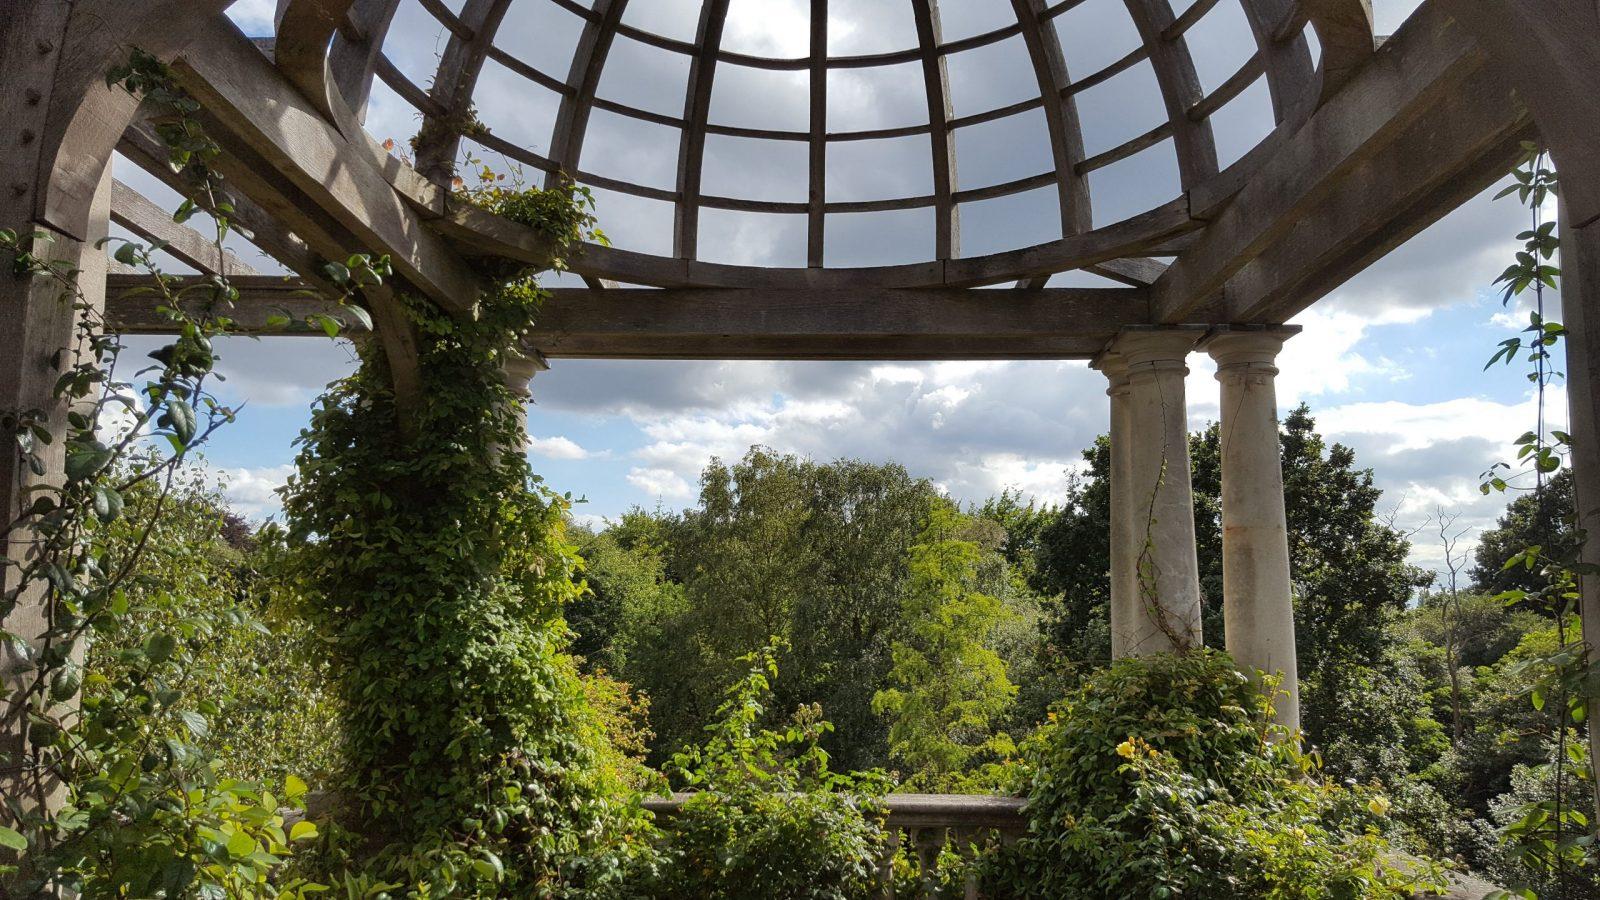 Visiting Hill Garden & Pergola, Hampstead Heath: Photo Gallery 2